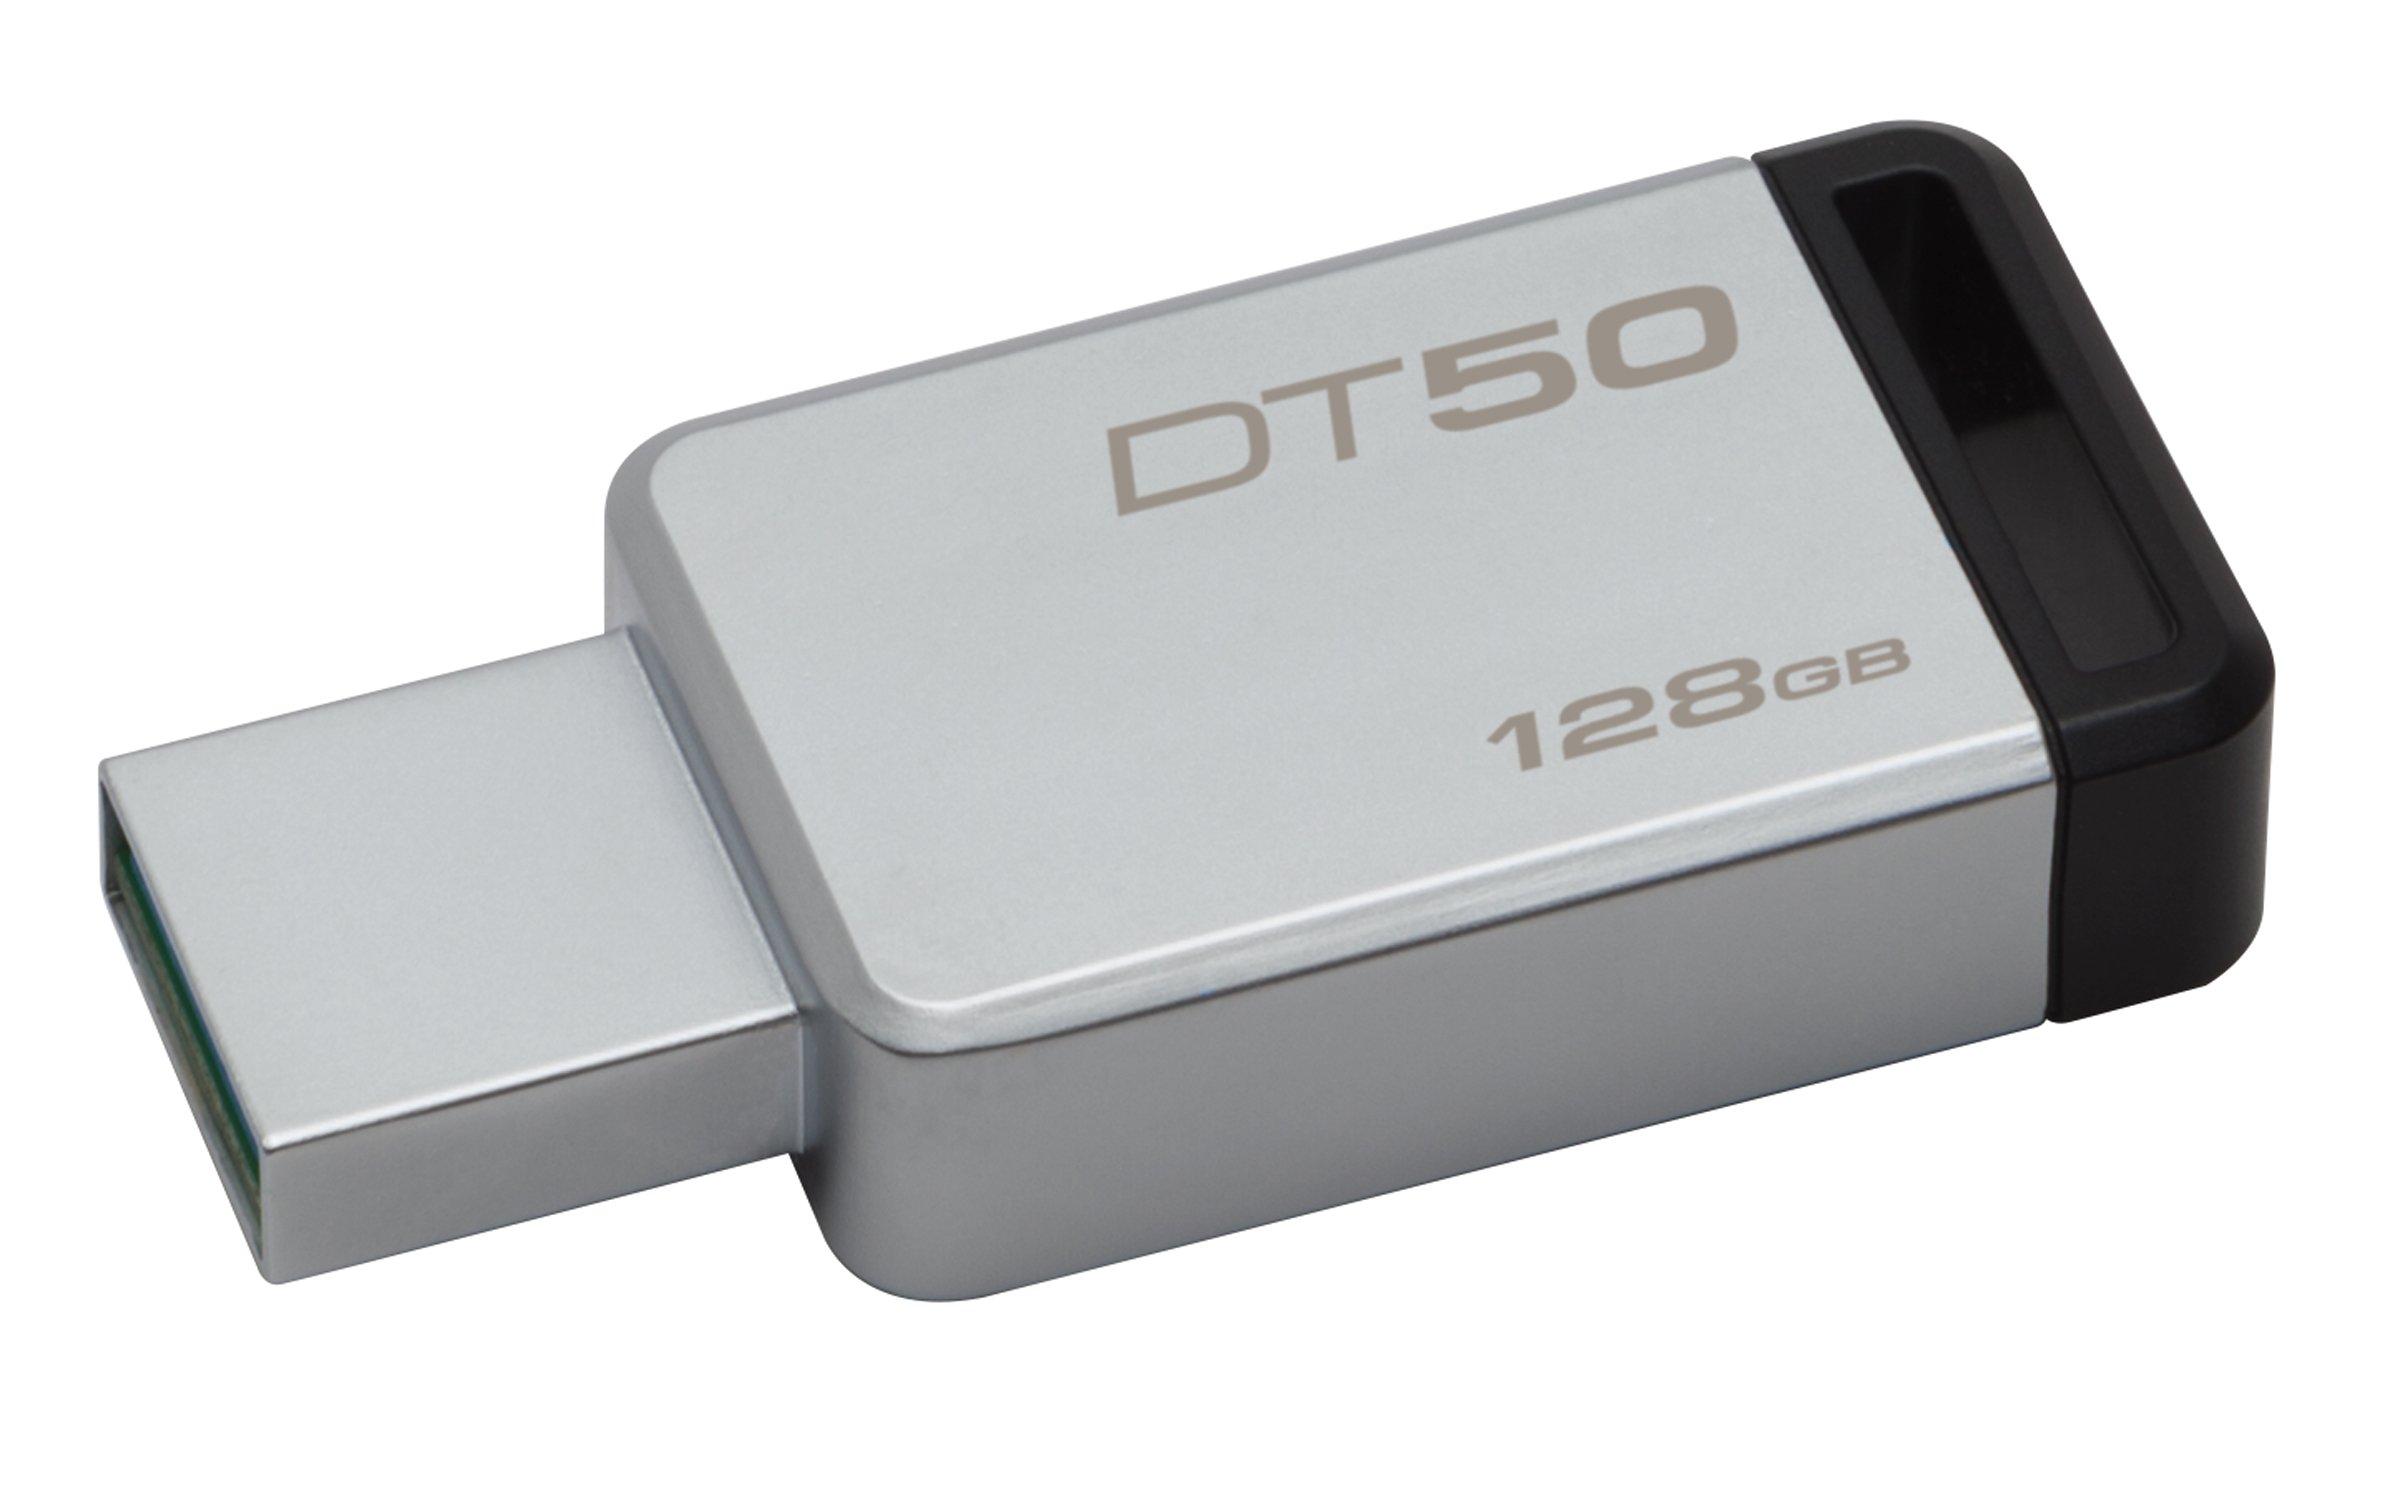 Kingston DataTraveler 128GB USB 3.0 Flash Drive (Gray) product image